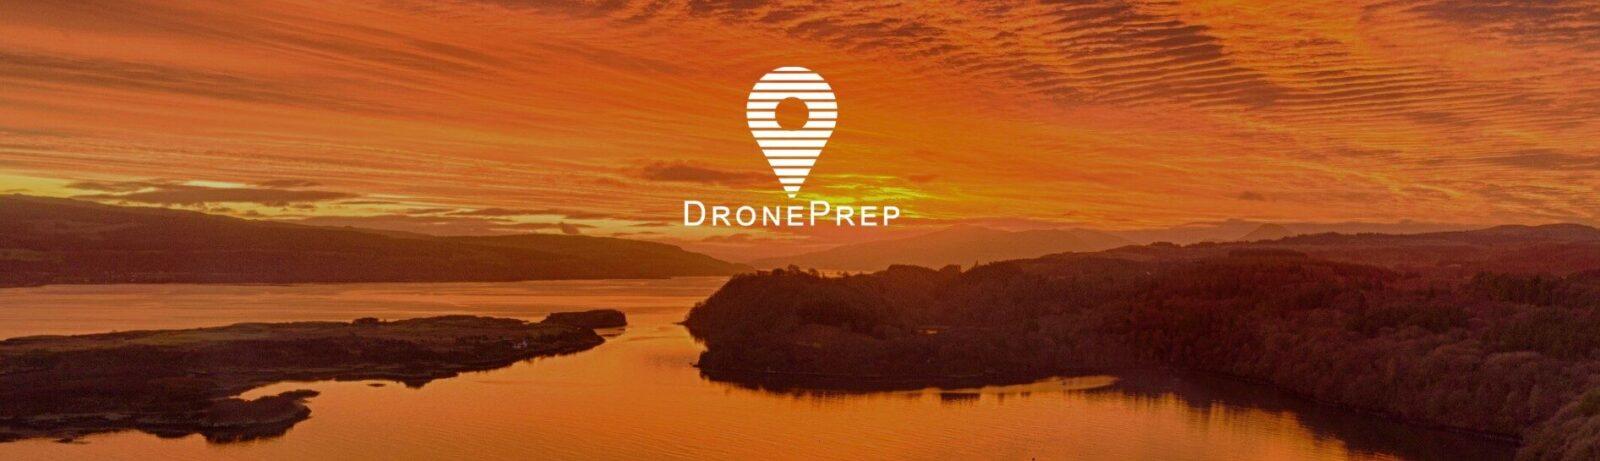 Программа «Microsoft for Startups Program» предложила спонсорскую поддержку компании DronePrep